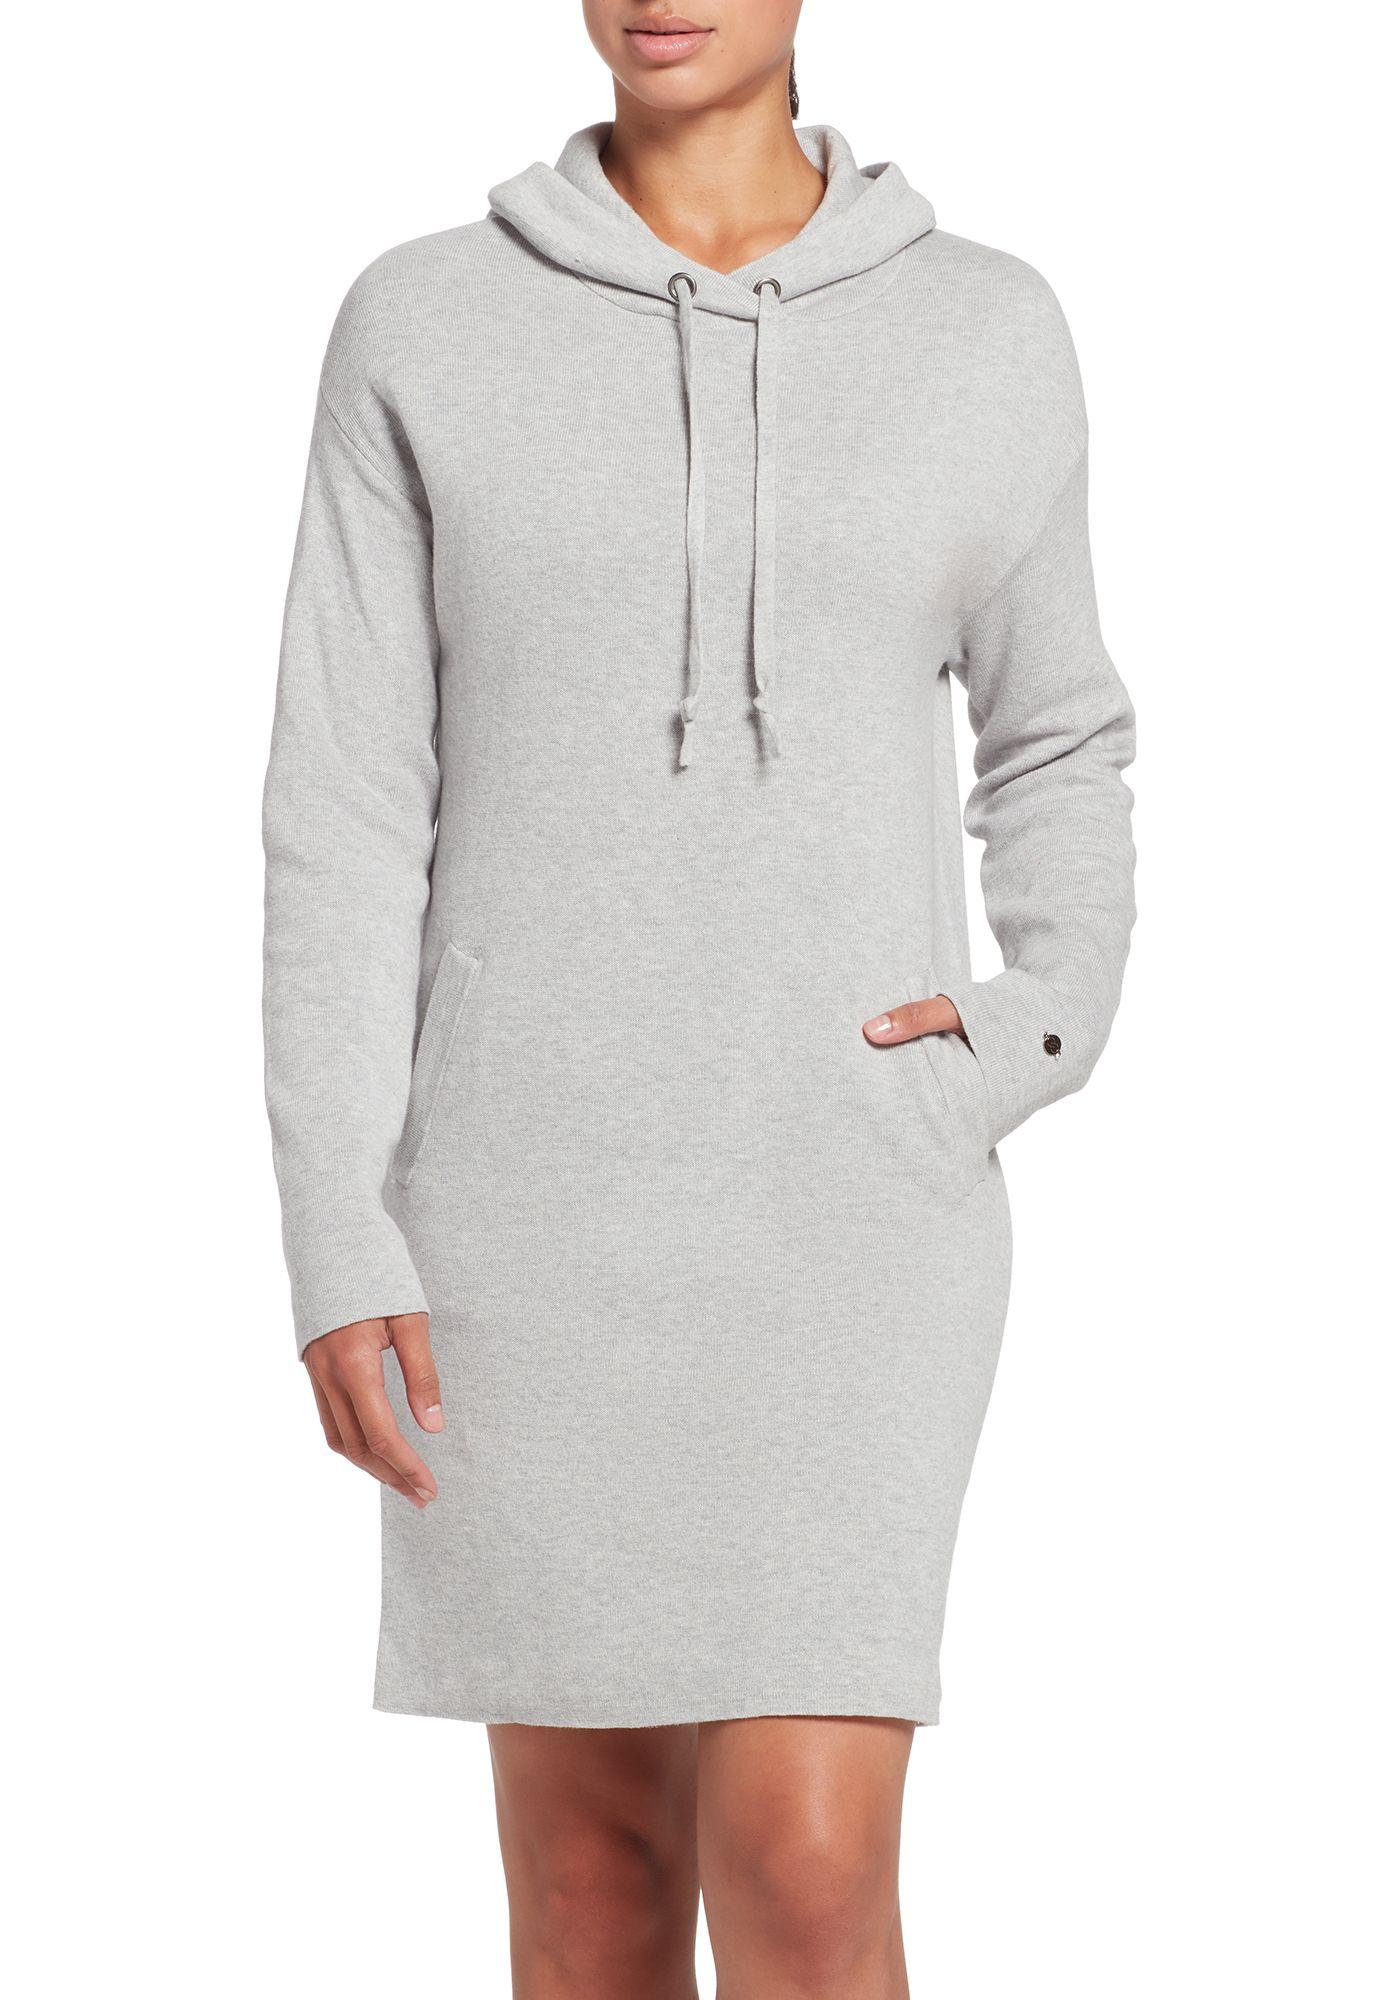 CALIA by Carrie Underwood Women's Journey Hooded Sweater Dress